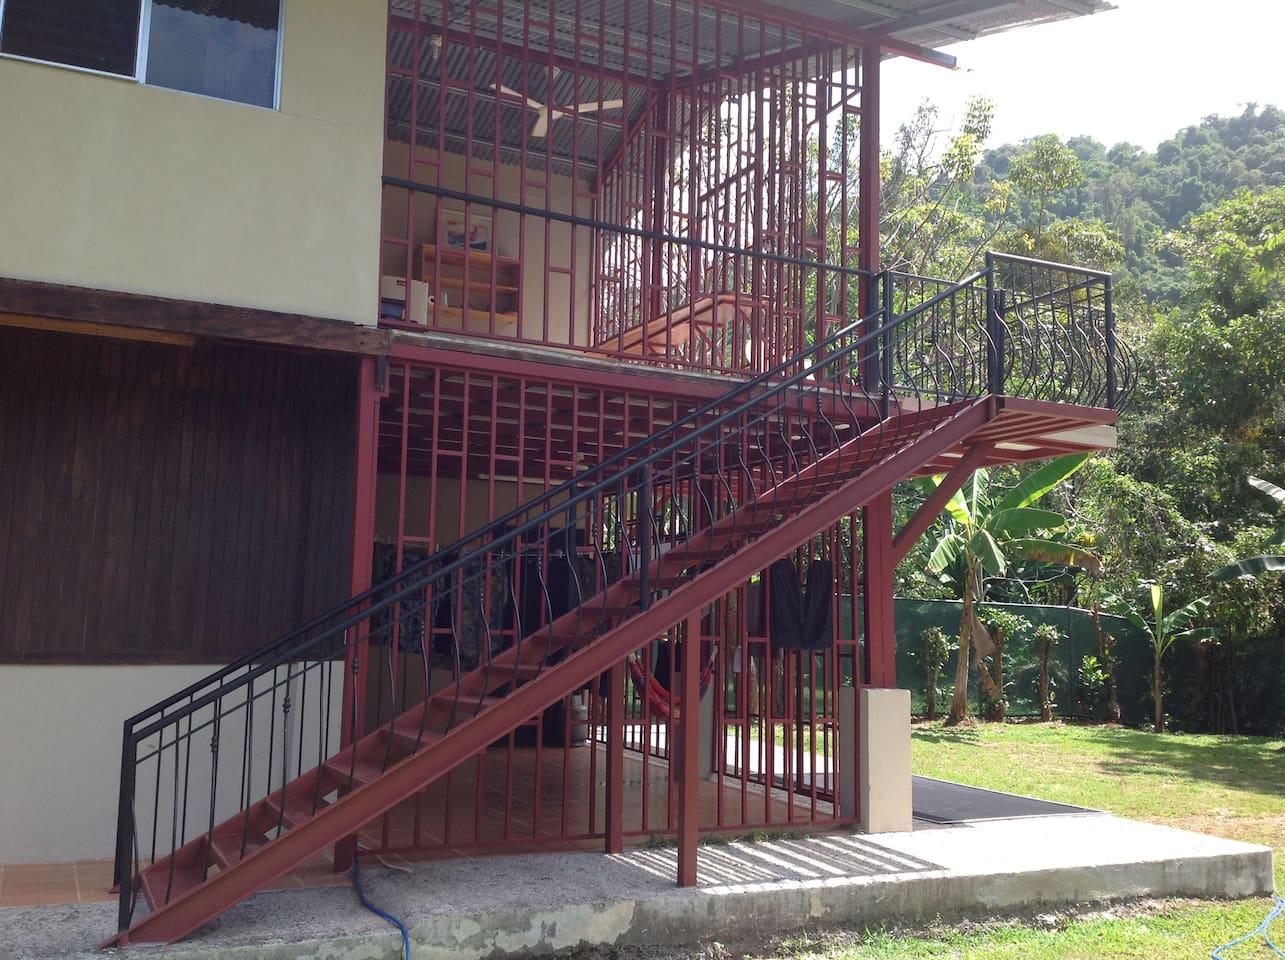 Stairway to upstairs Kitchen, Verandas and Rooms...